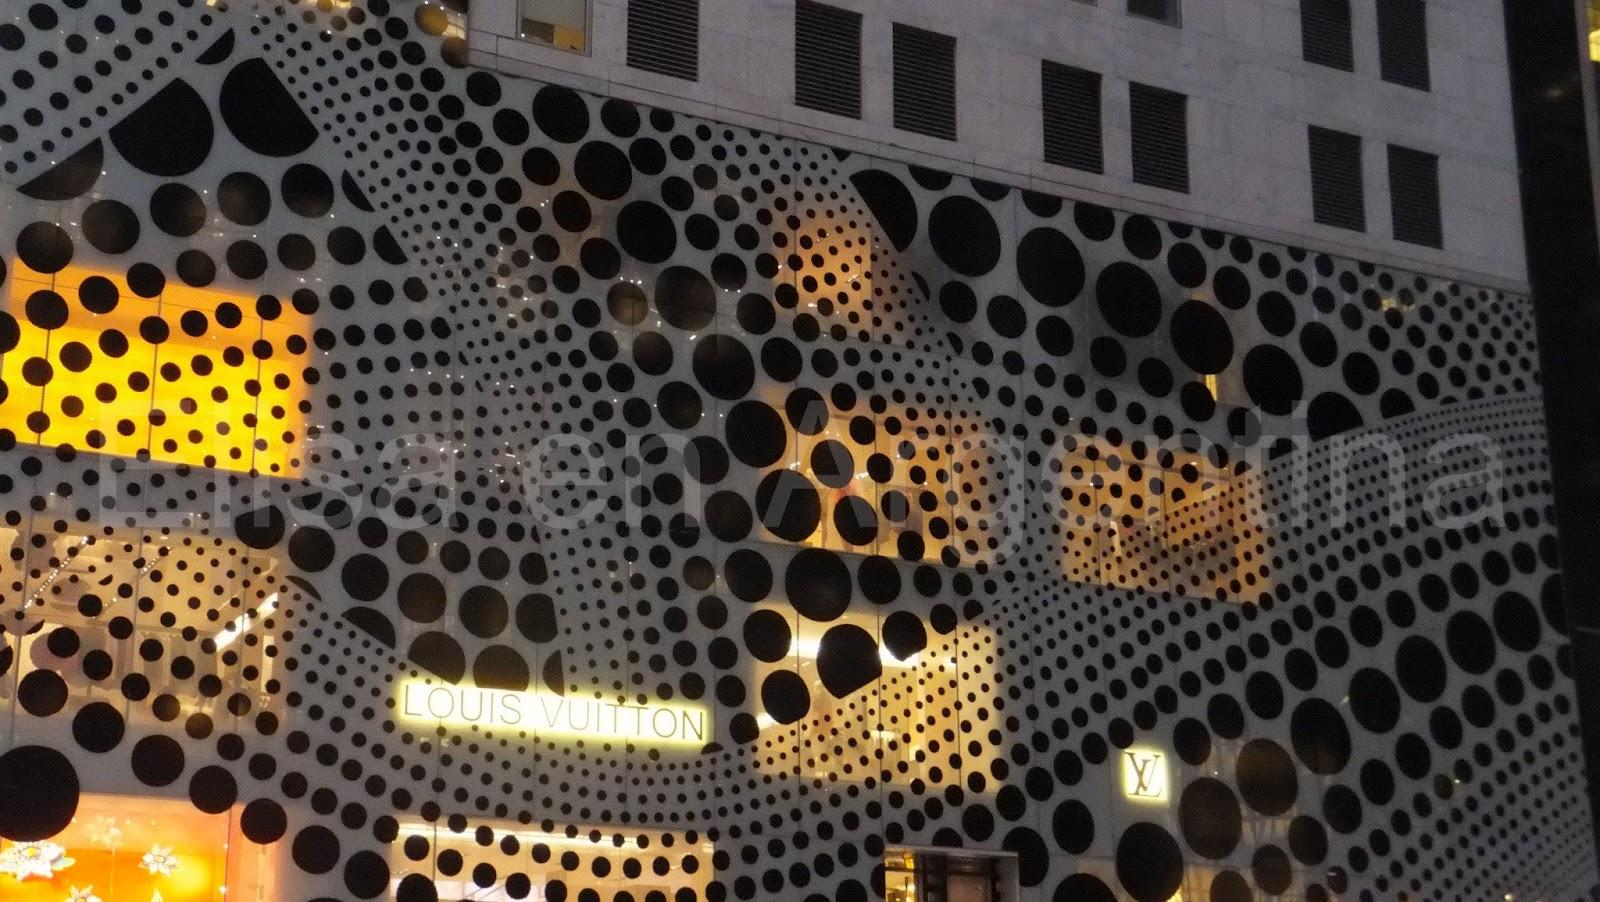 Dots Infinity de Yayoi Kusama